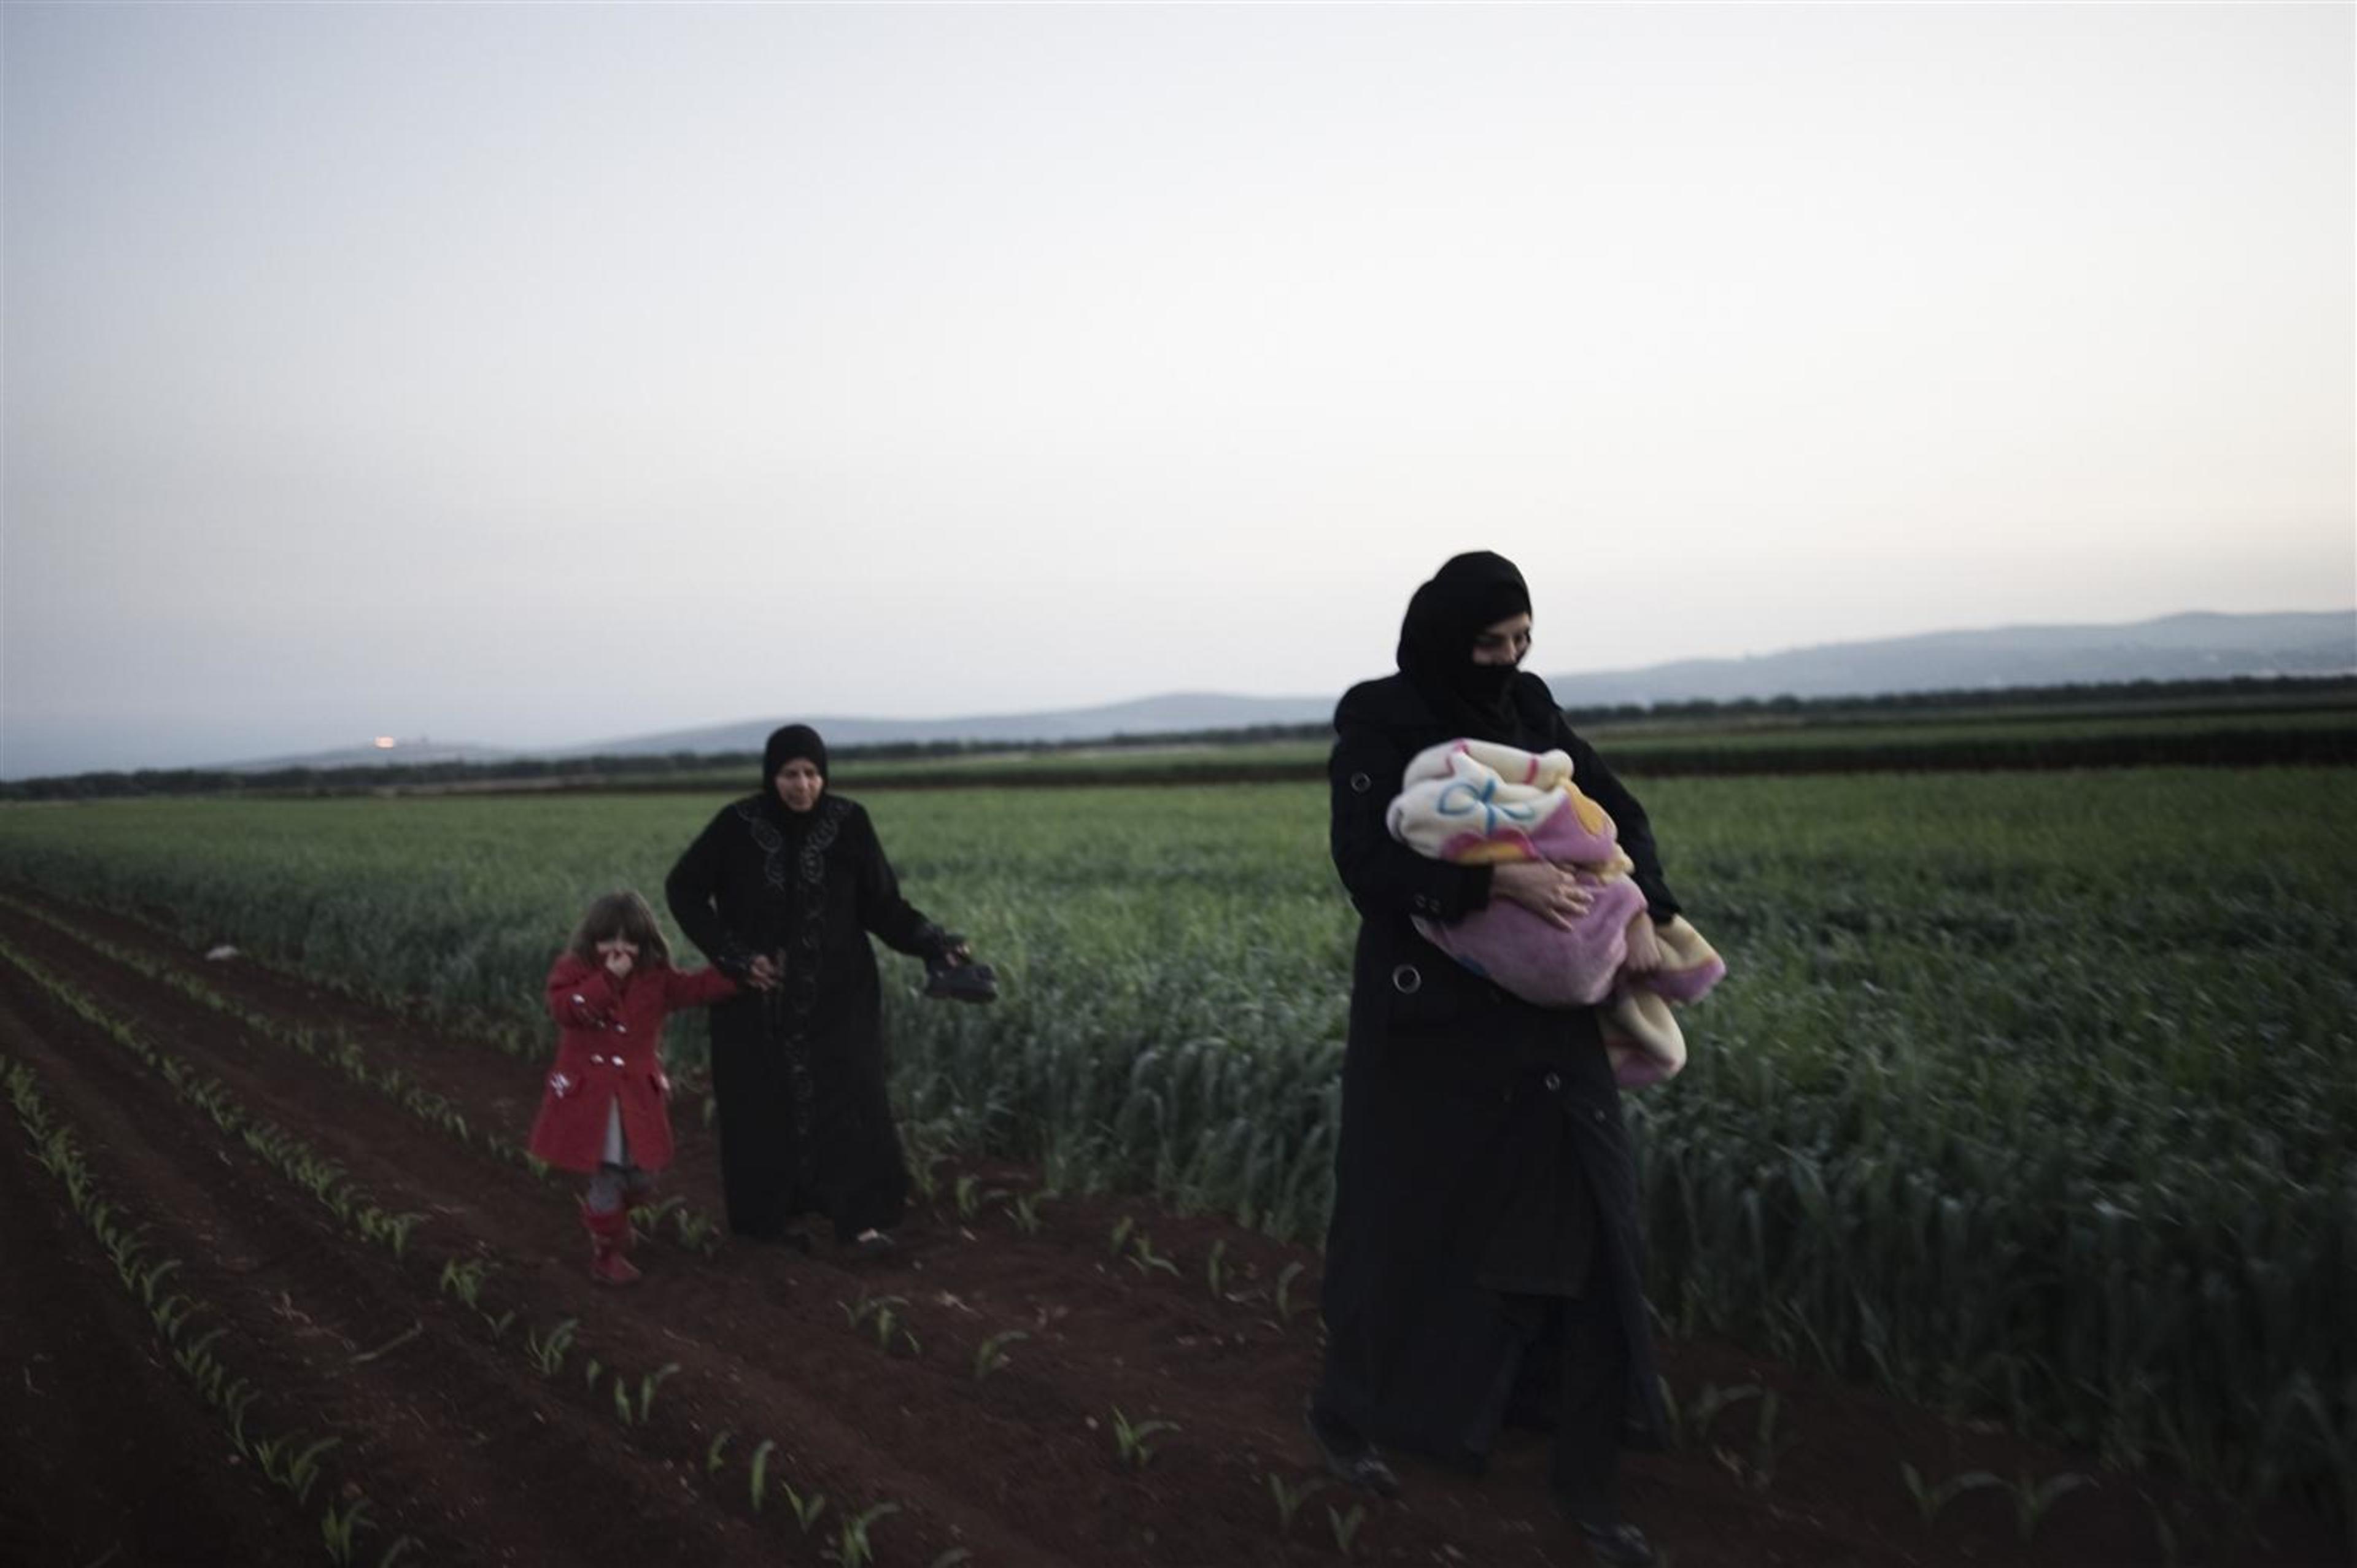 © UNICEF/UN0394/Romenzi